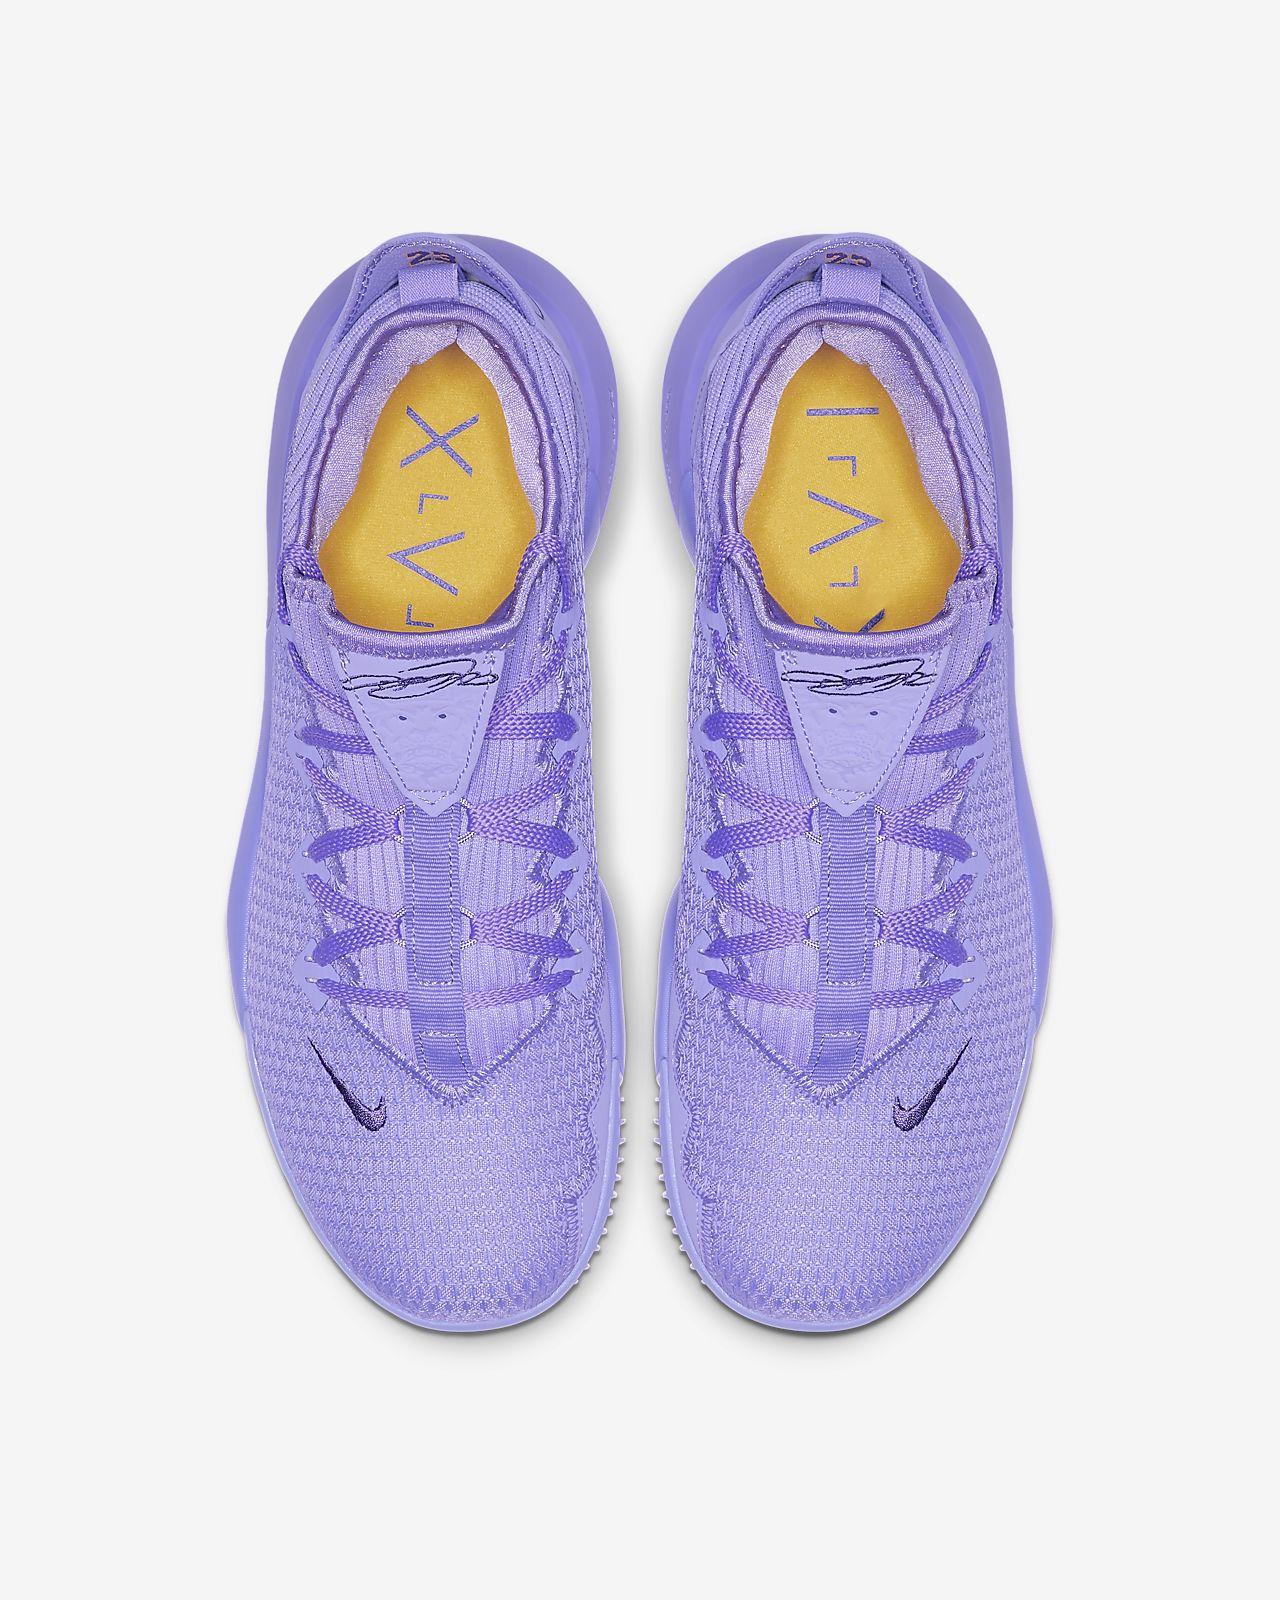 premium selection a1e95 c6b2f LeBron 16 Low Basketball Shoe